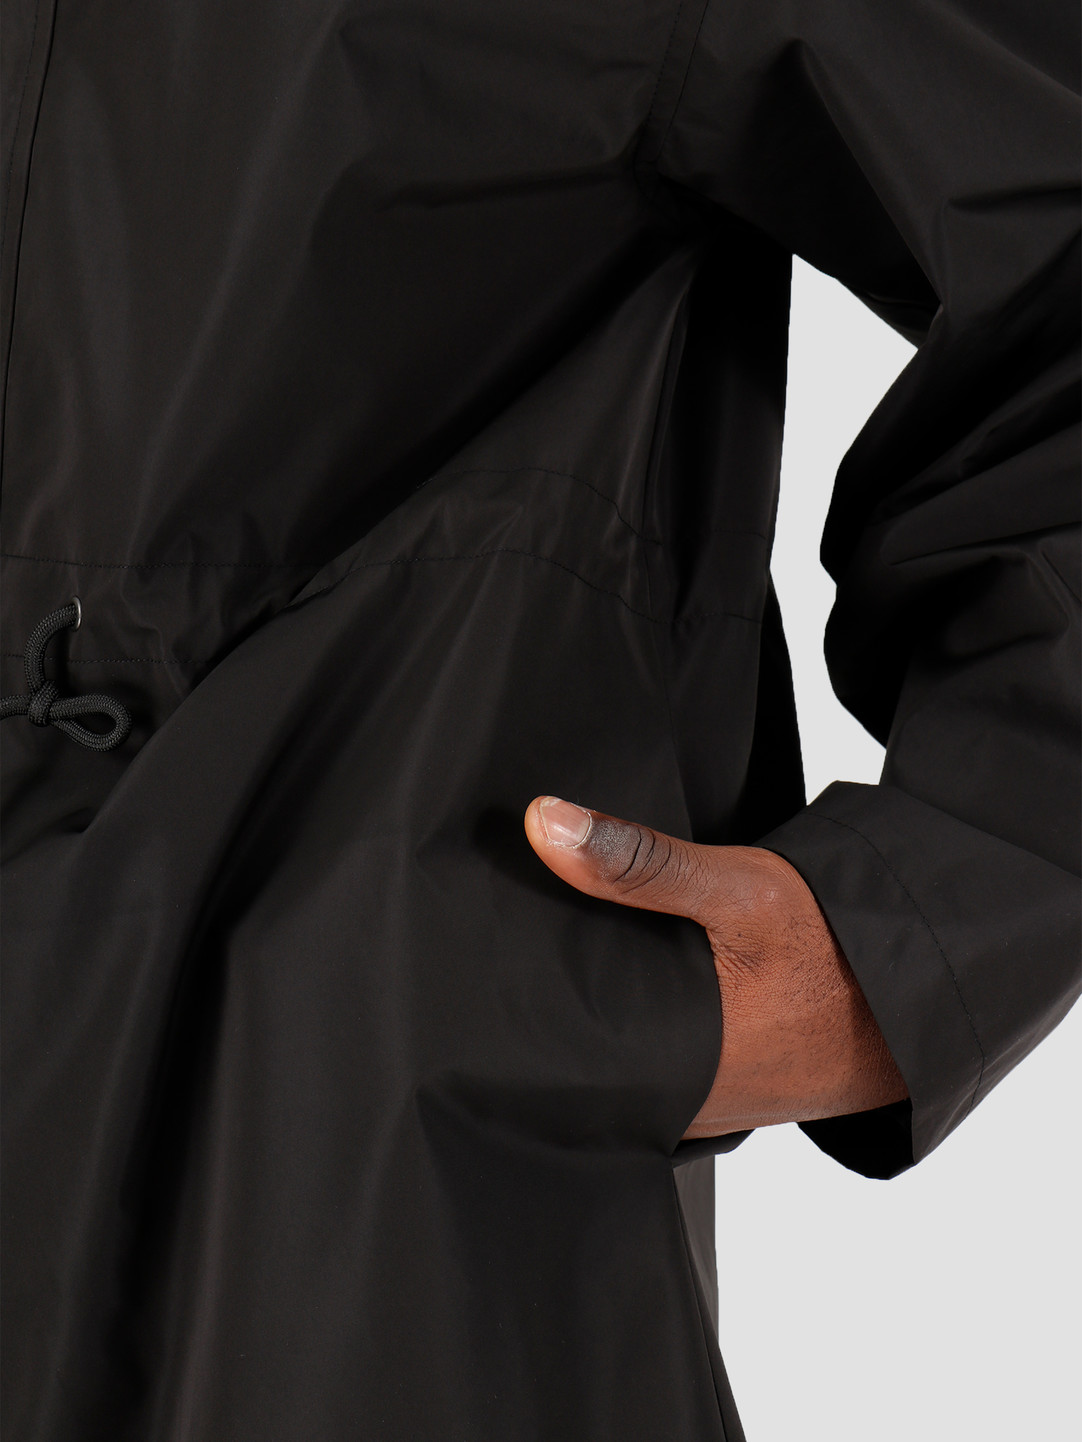 Daily Paper Daily Paper Atec Jacket Black 20E1OU02-01